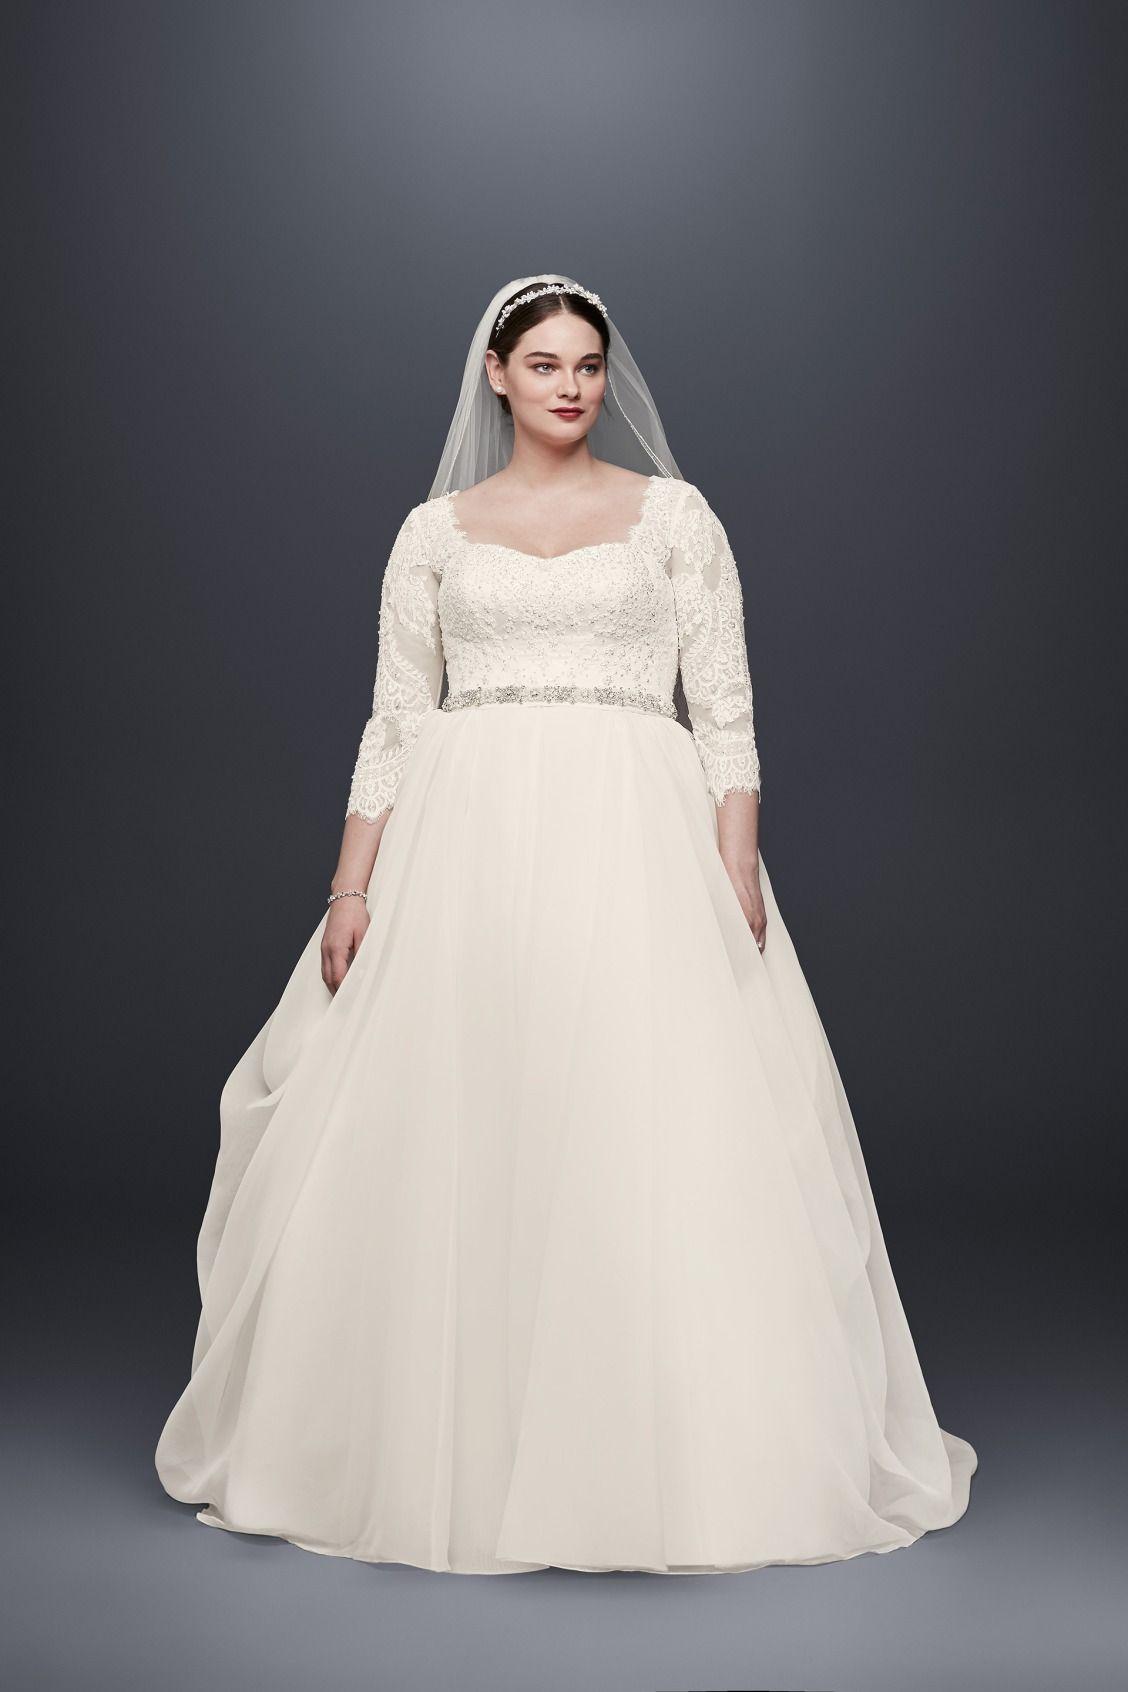 fall wedding dress inspiration | 3/4 sleeve lace and organza plus